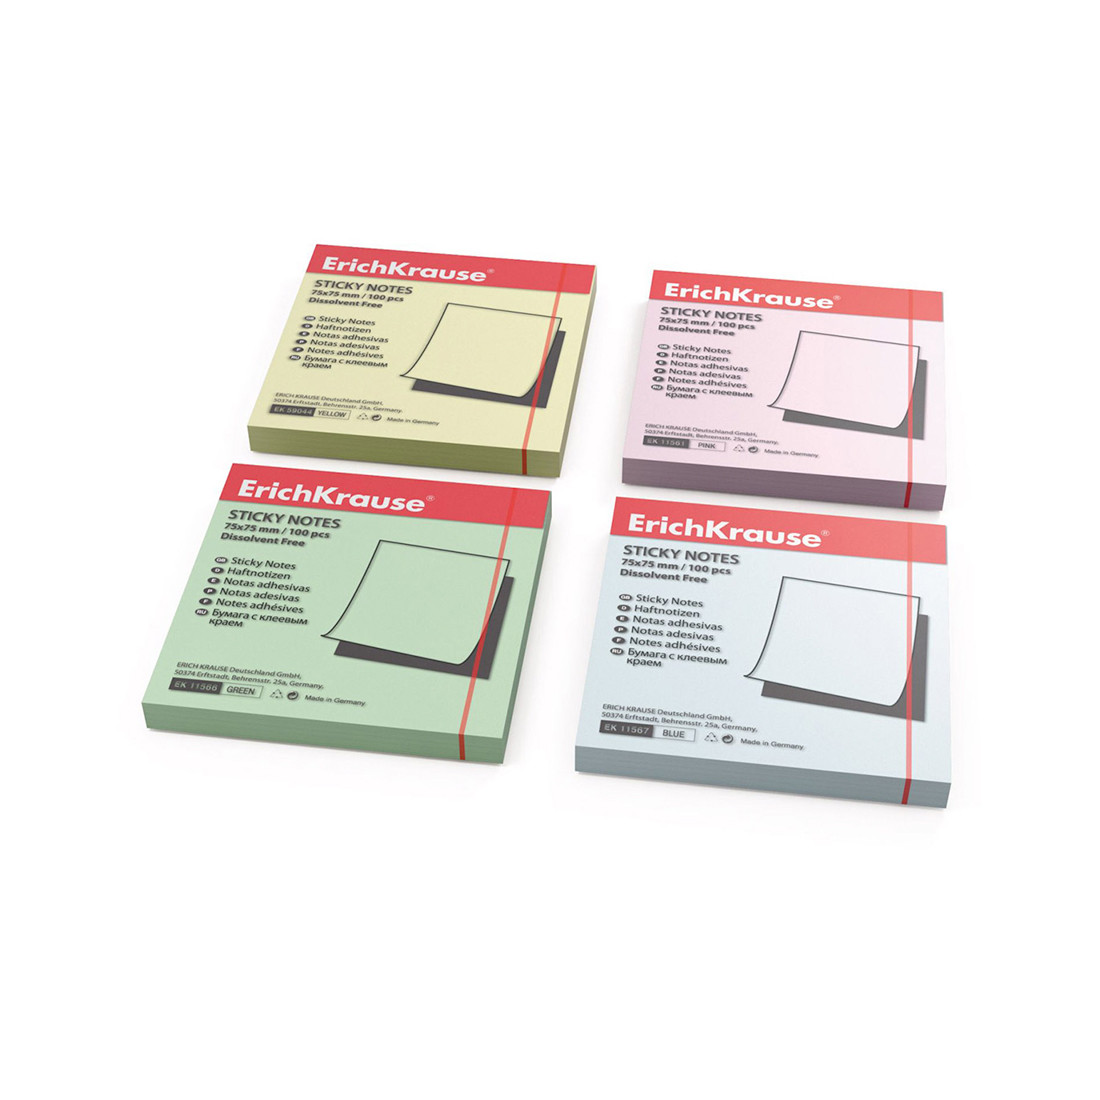 Бумага для заметок с клеевым краем ErichKrause®, 75х75 мм, 100 листов, в пленке 10 шт., зеленый